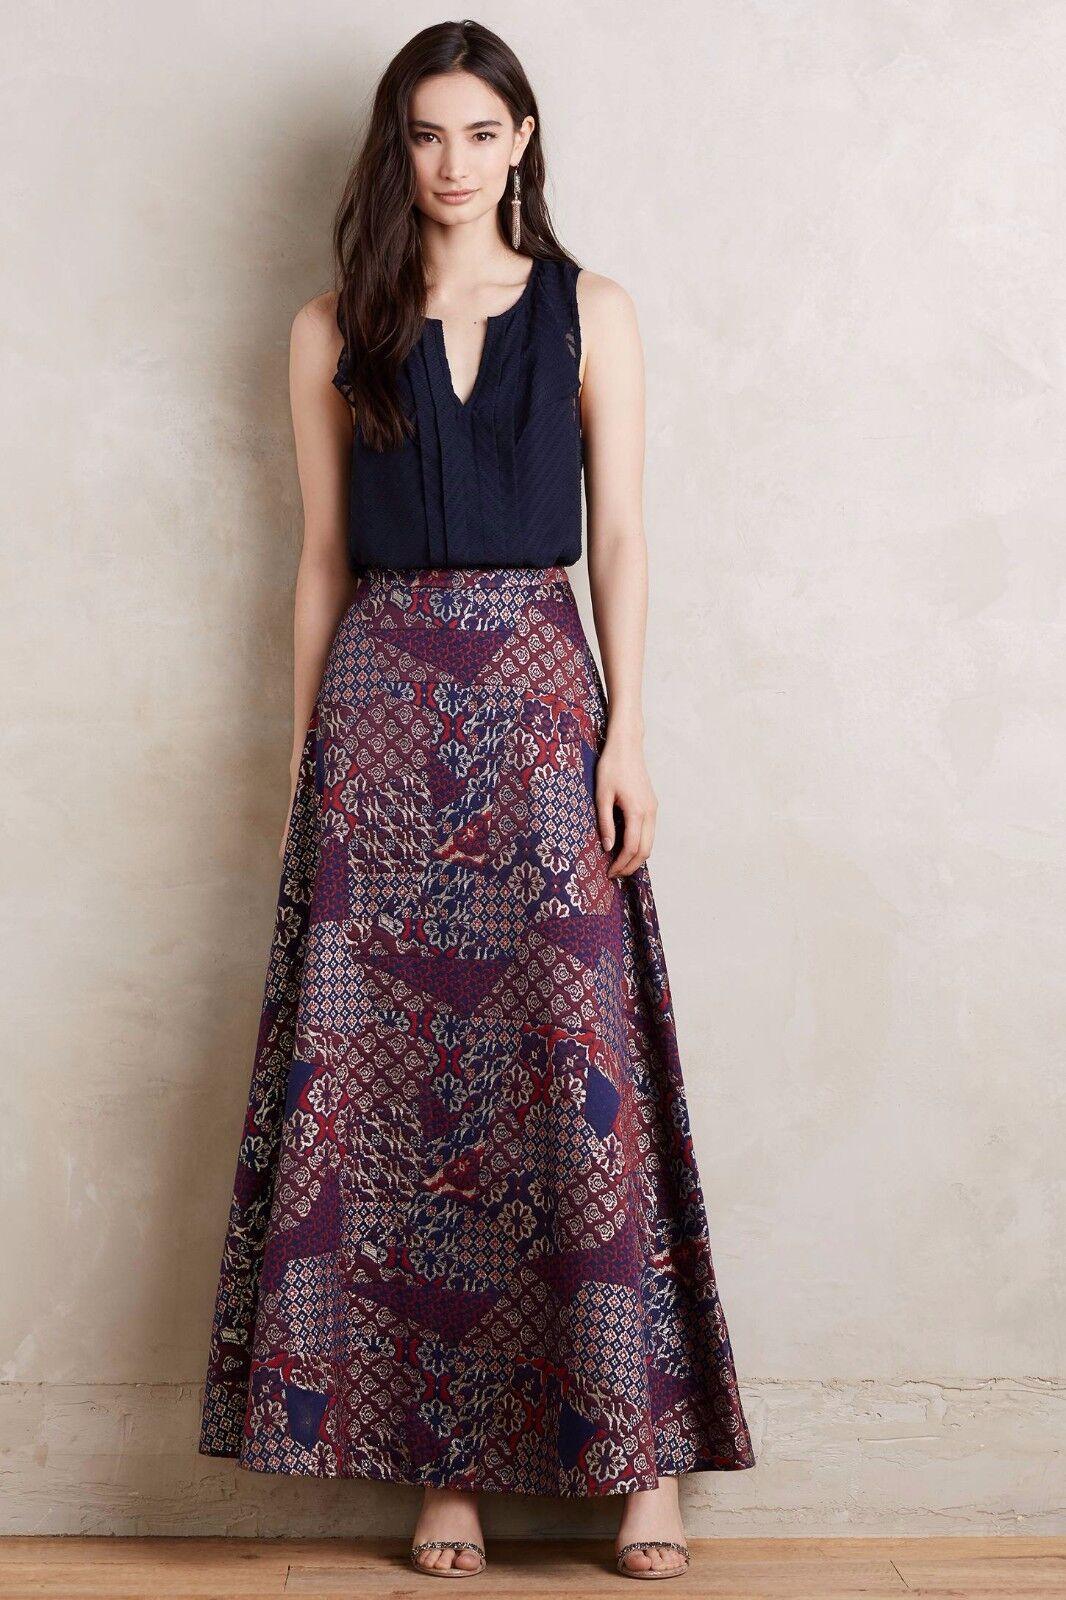 NWT ANTHROPOLOGIE Brocade Ball Skirt by HD in Paris, 4, Elegant,